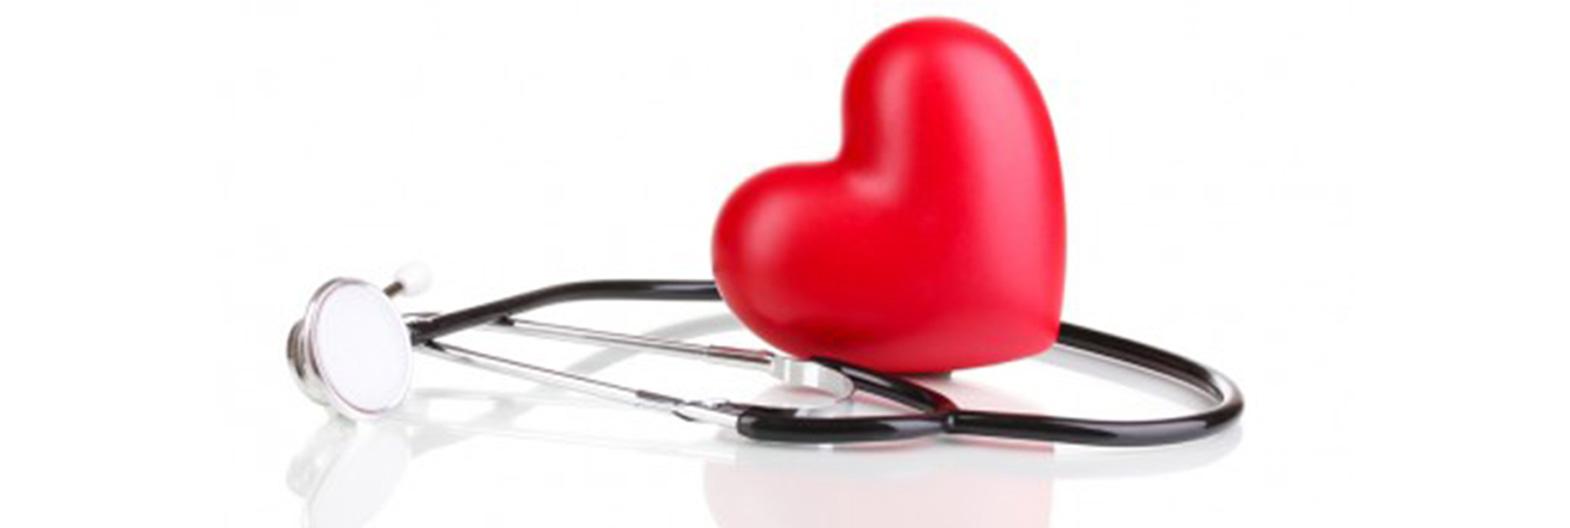 kuris serga jauna hipertenzija